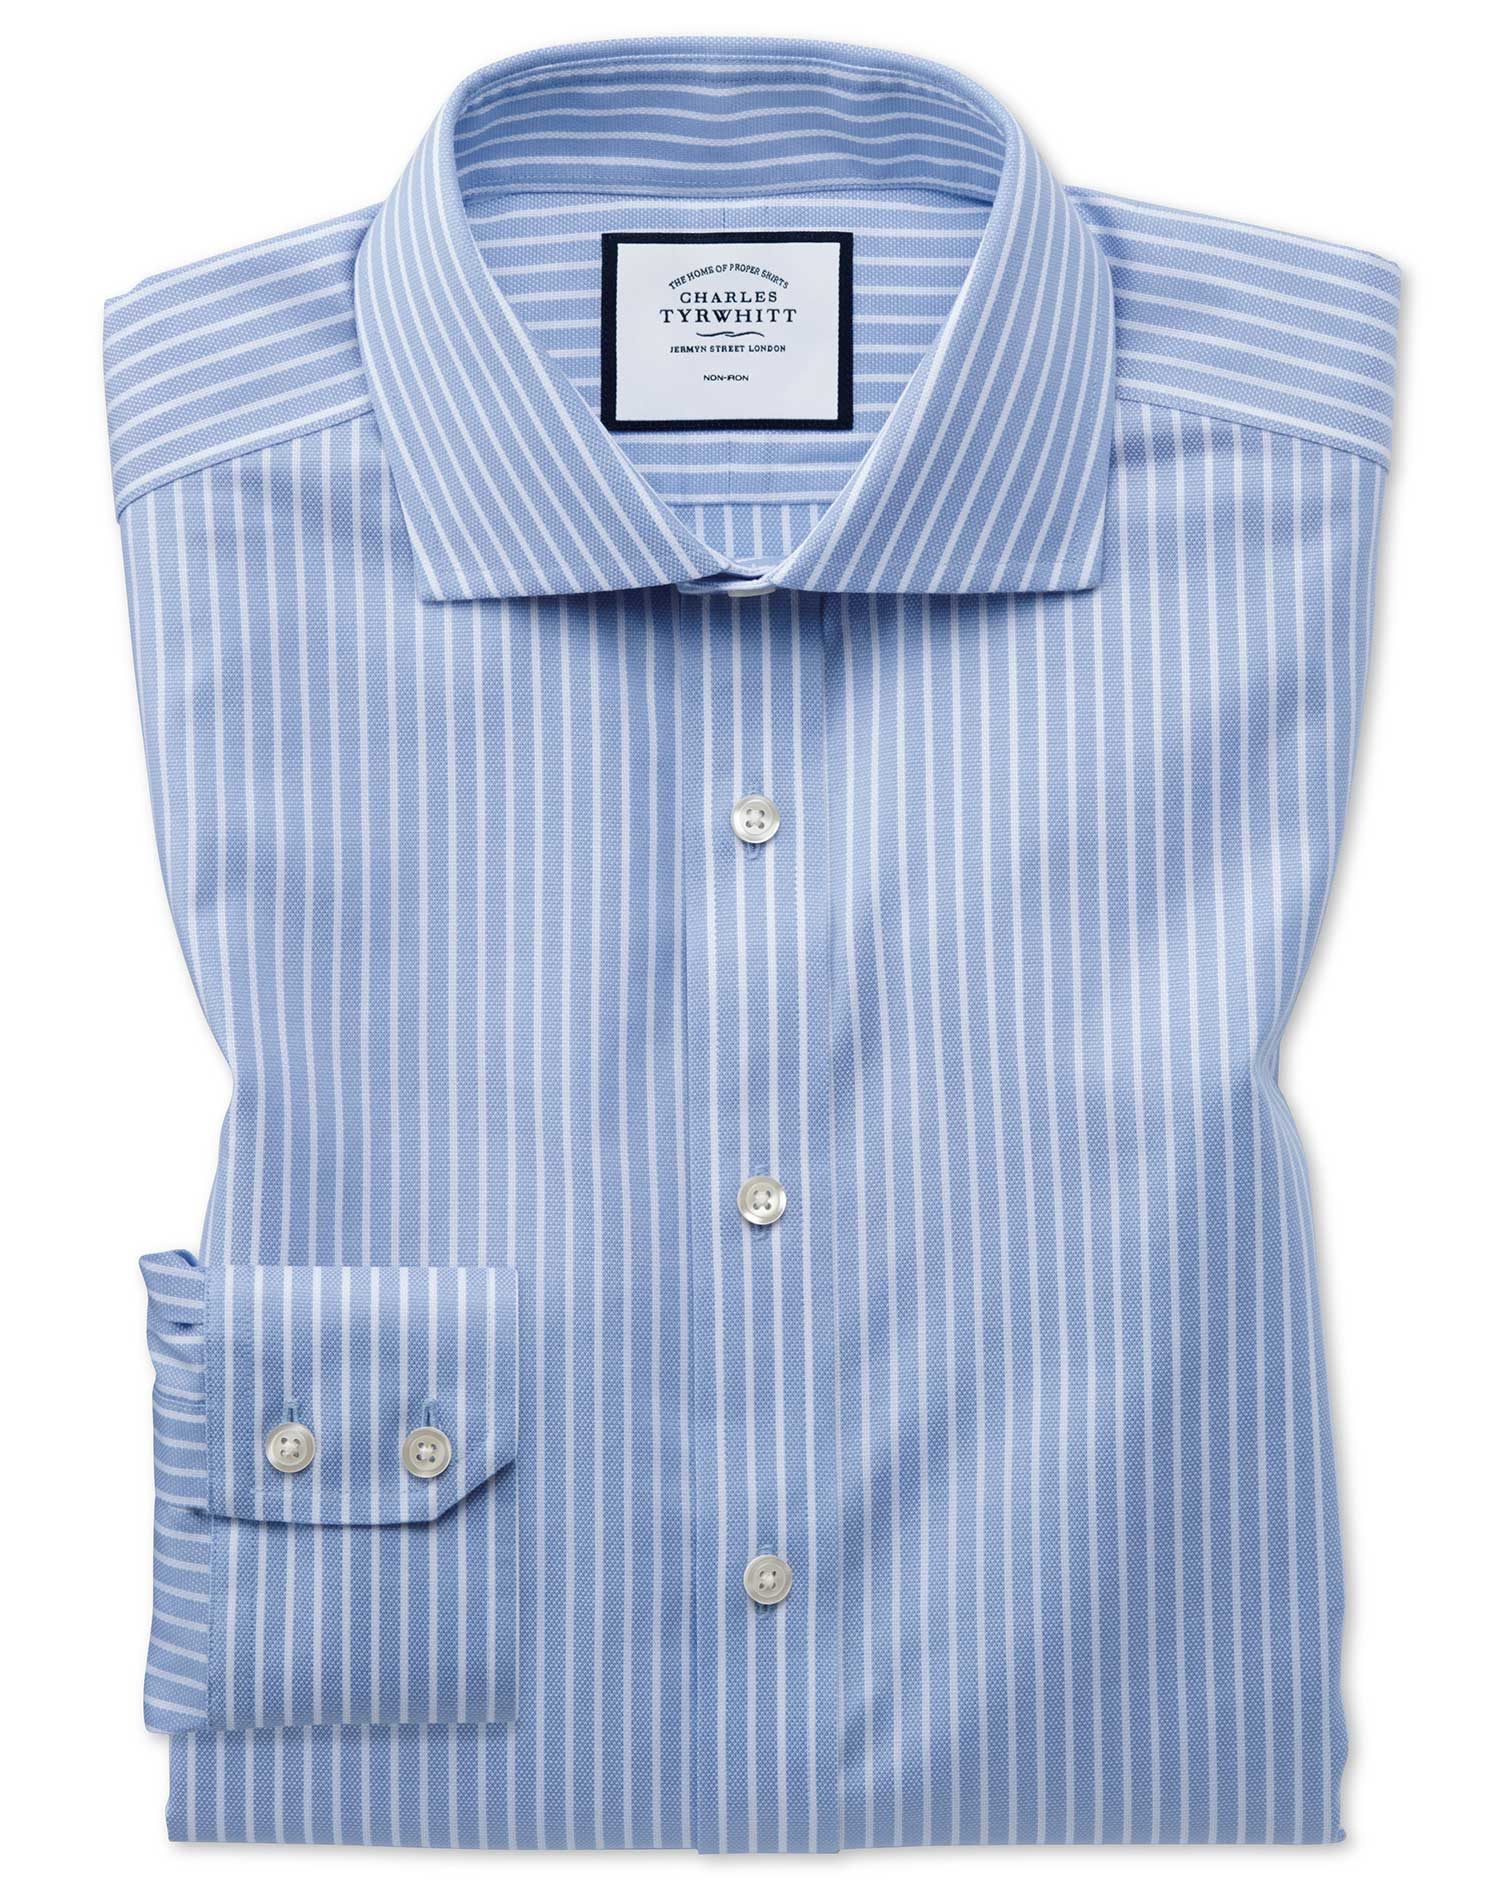 Slim Fit Non-Iron Cotton Stretch Oxford Sky Blue and White Stripe Formal Shirt Single Cuff Size 17/3